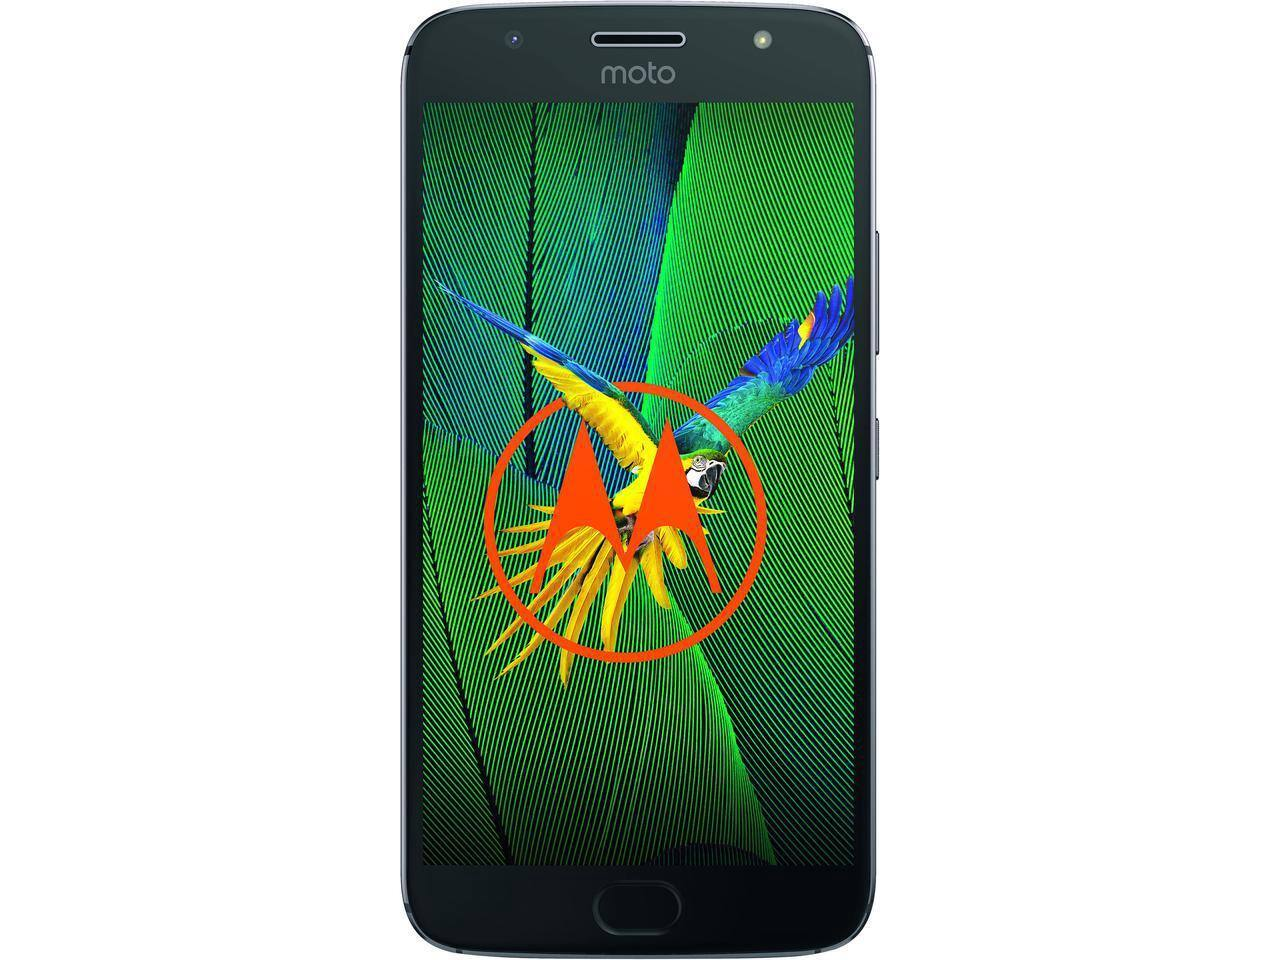 Moto G5s Plus (Special Edition) Unlocked Smartphone Dual Camera 5.5 in. Lunar Gray, 64GB Storage 4GB RAM $259.99 AC Free Shipping